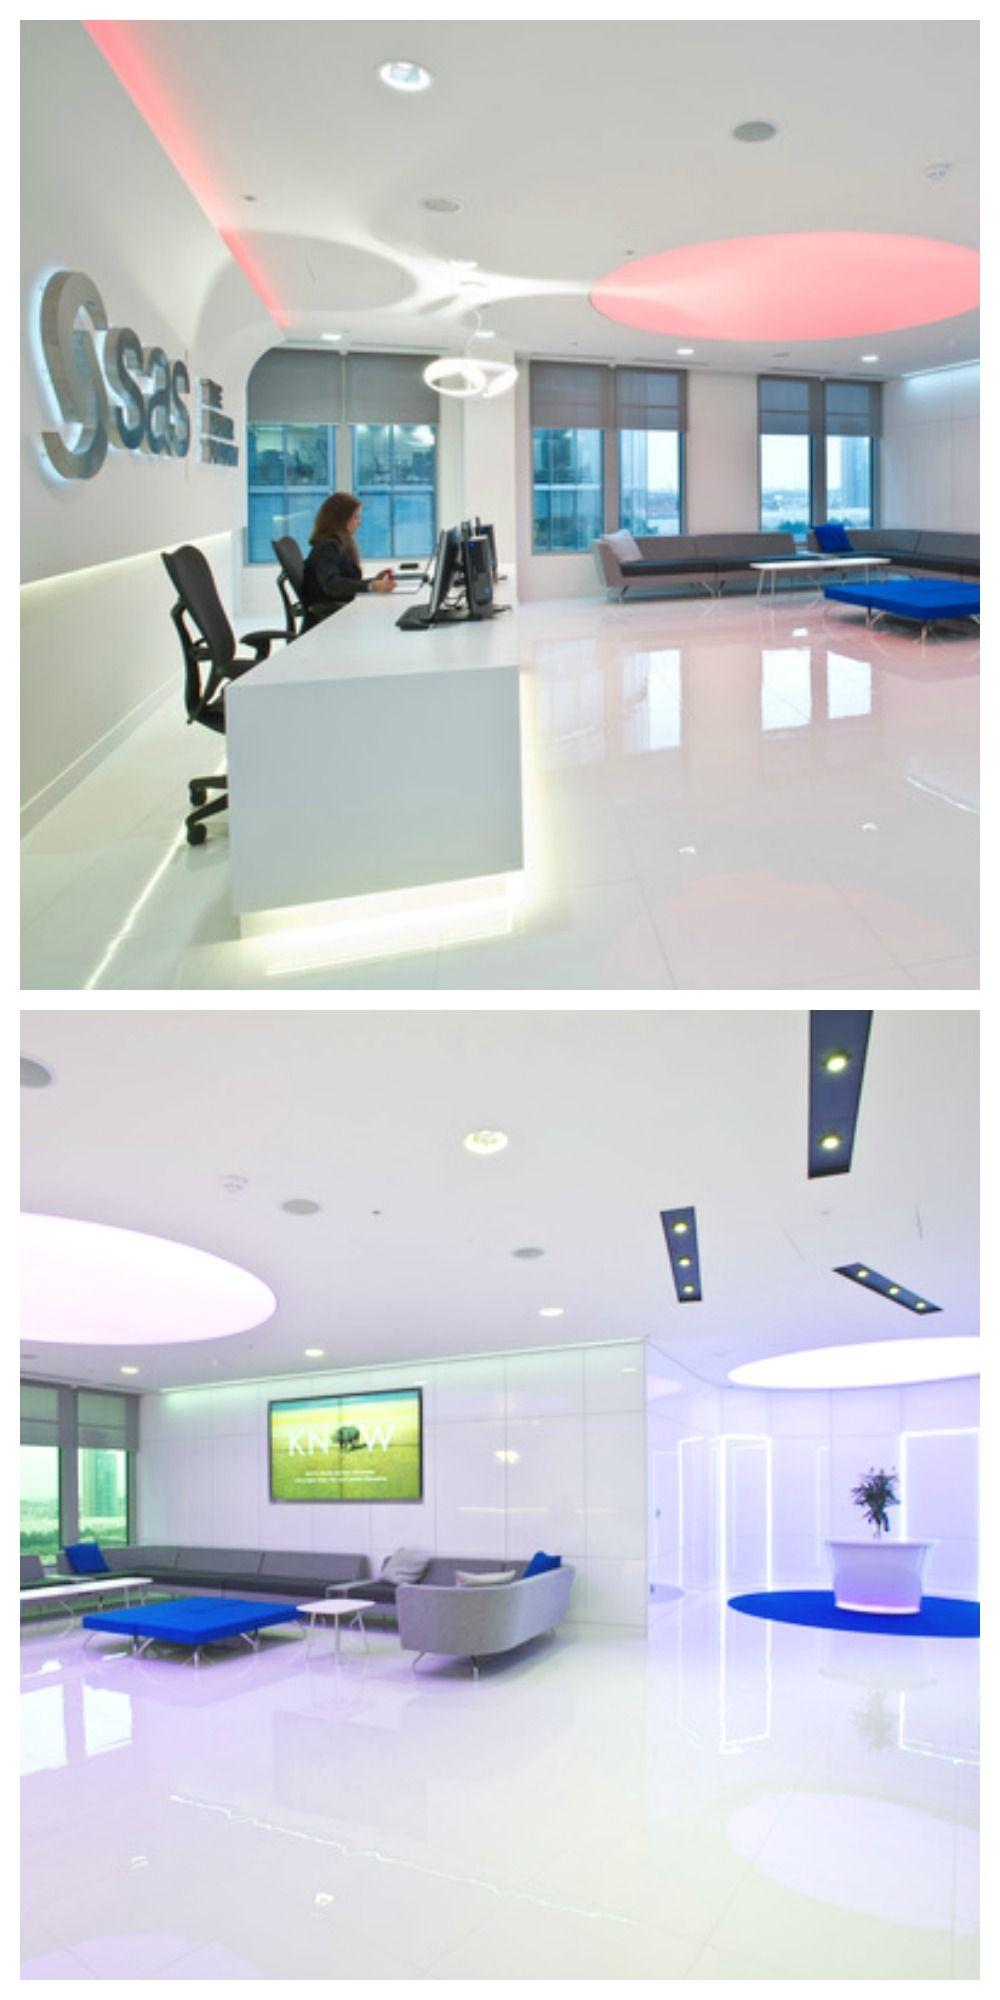 rackspace office morgan. Inspirational Office Design | Designs, Workplace And Rackspace Morgan